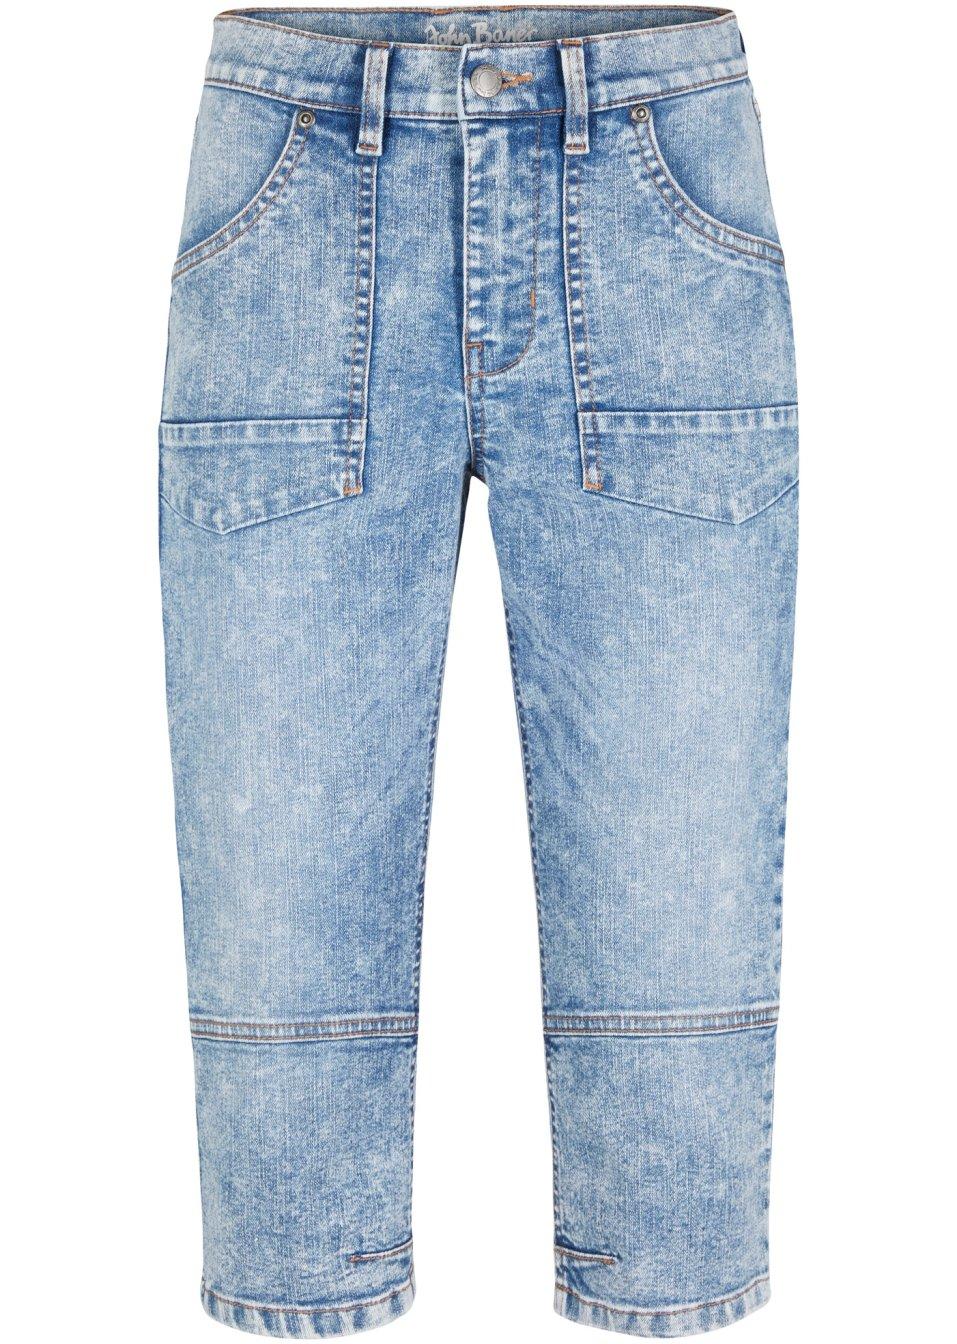 Stretch-Capri-Jeans hellblau - Damen - bonprix.de h8zbz 5F08D